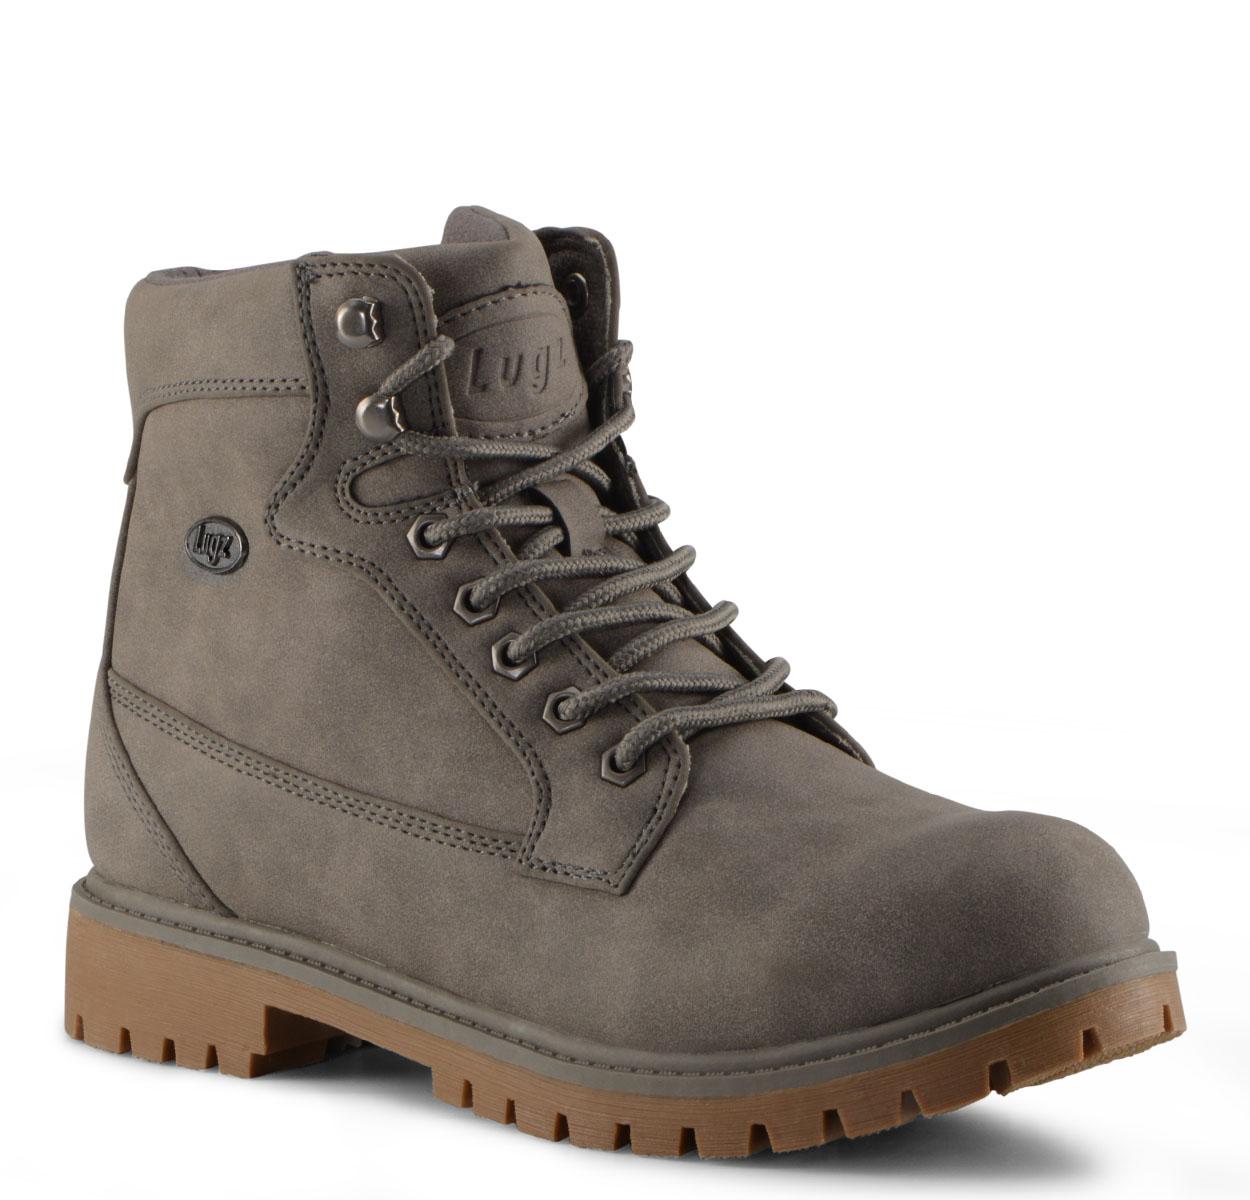 Men's Mantle Hi 6-Inch Boot (Choose Your Color: CHARCOAL/GUM, Choose Your Size: 8.5)